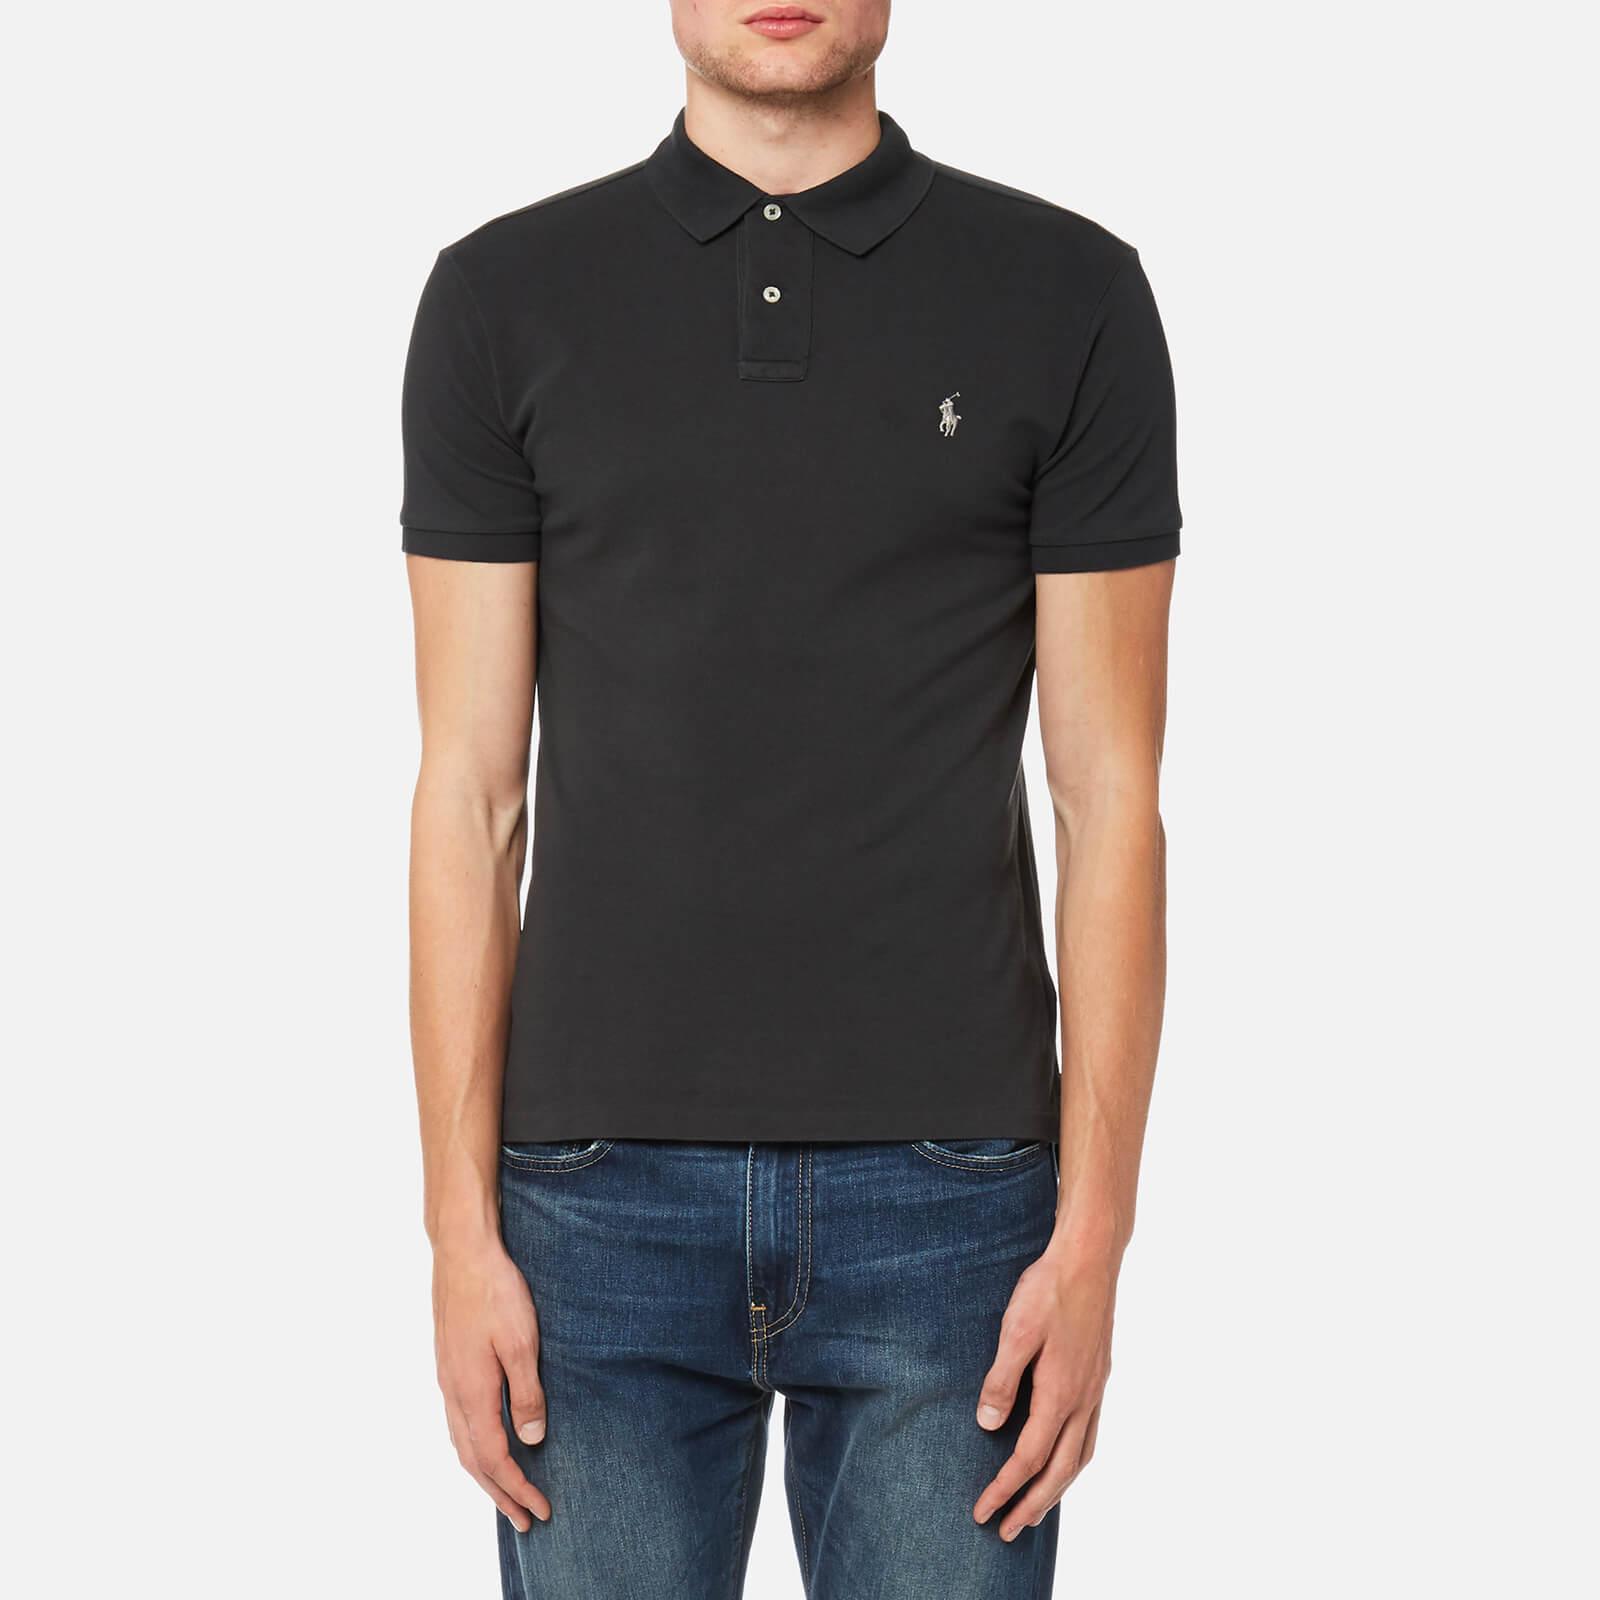 Polo Ralph Lauren Mens Slim Fit Mesh Polo Shirt Dark Carbon Grey